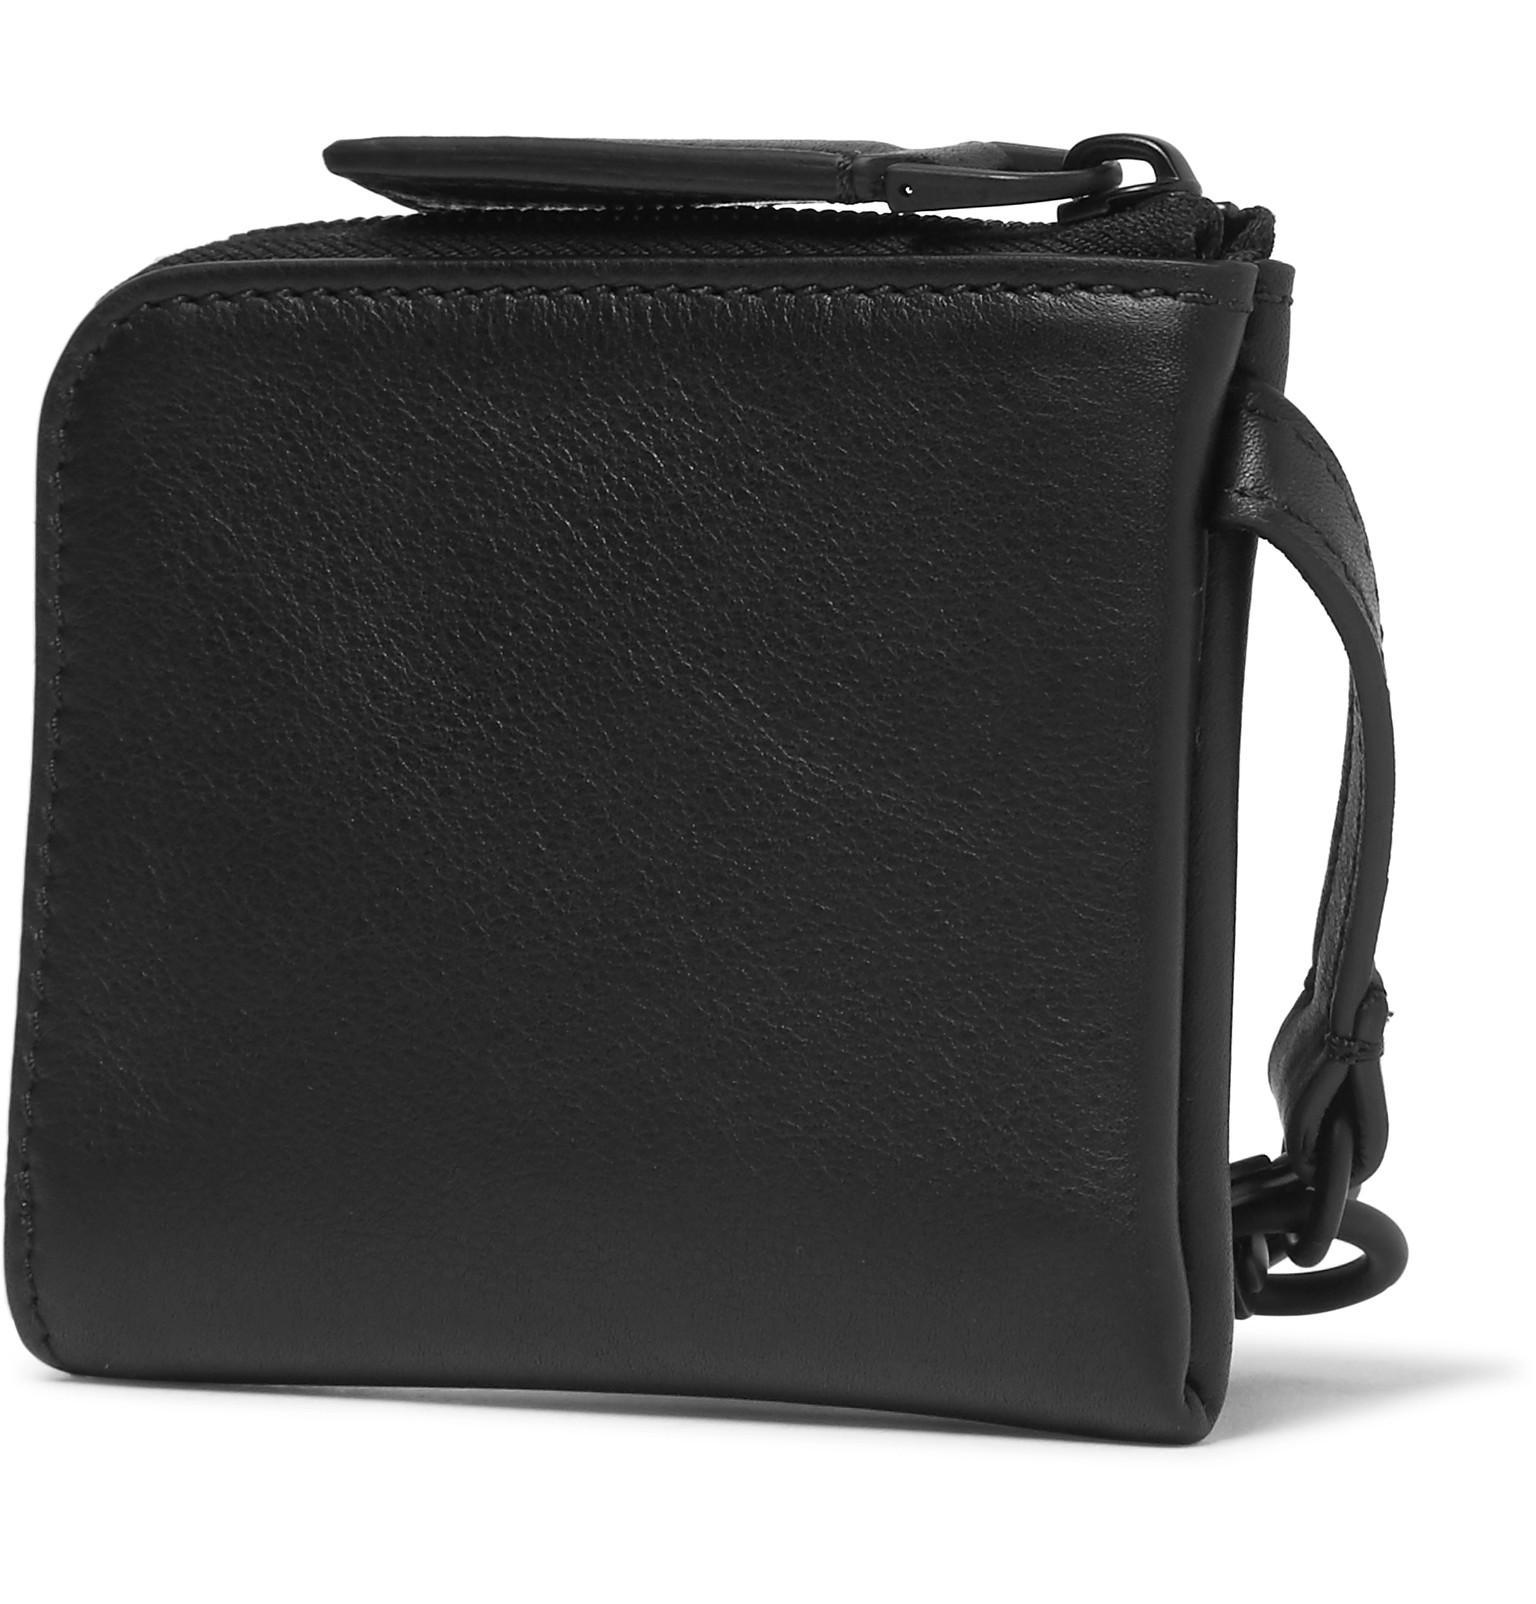 moncler wallet